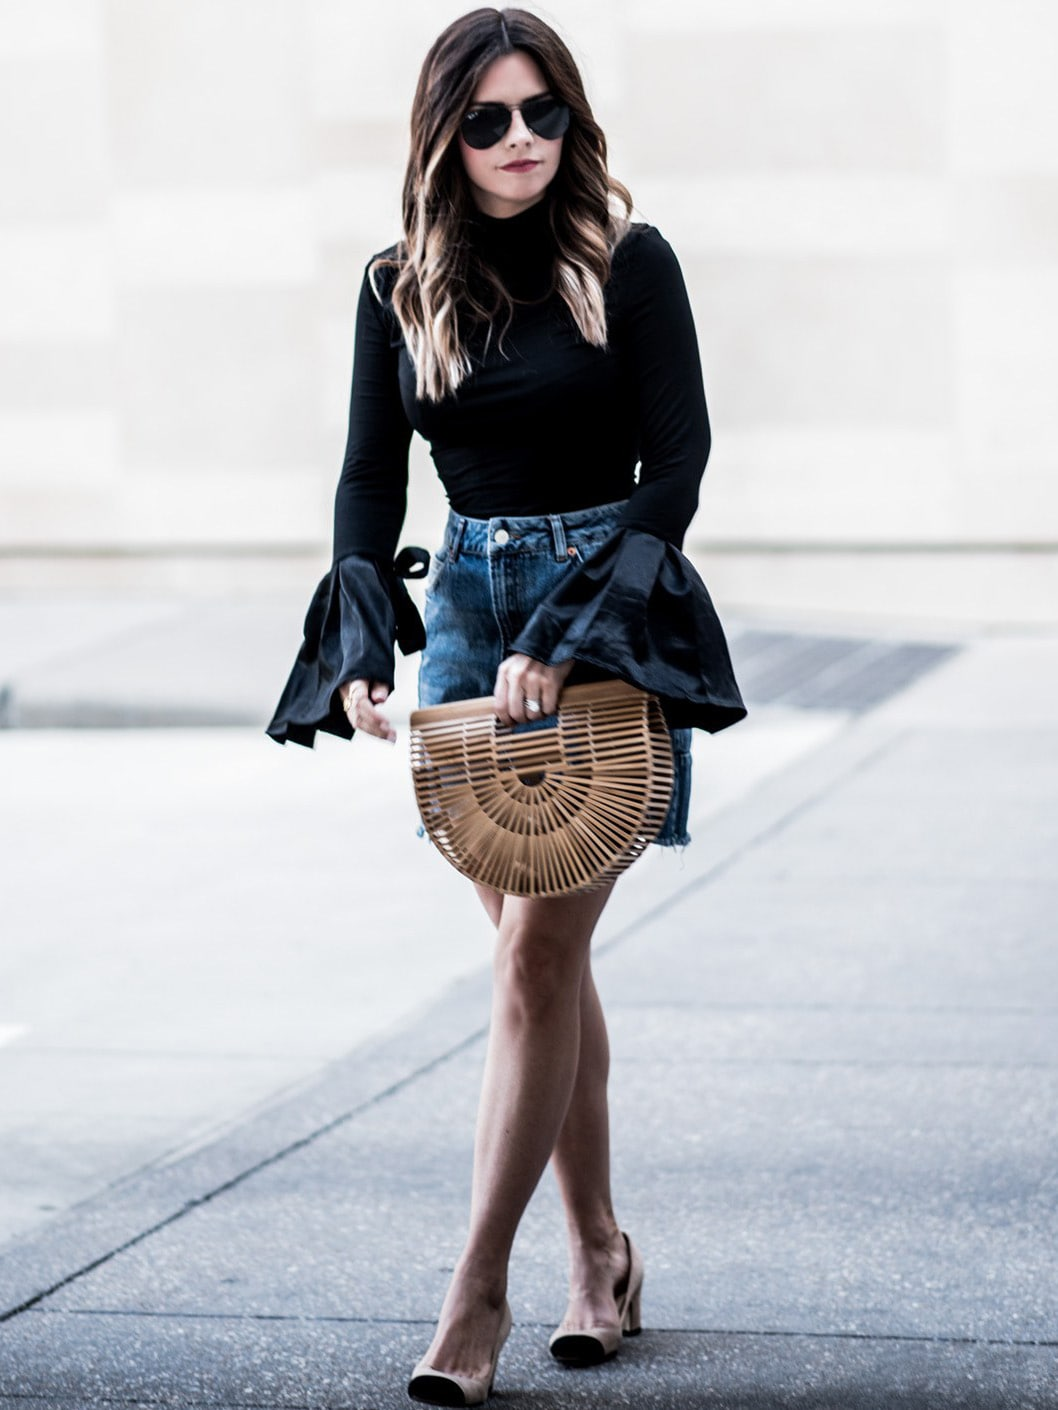 Black Bell Sleeve Slim T-ShirtBlack Bell Sleeve Slim T-Shirt<br><br>color: Black<br>size: L,M,S,XS